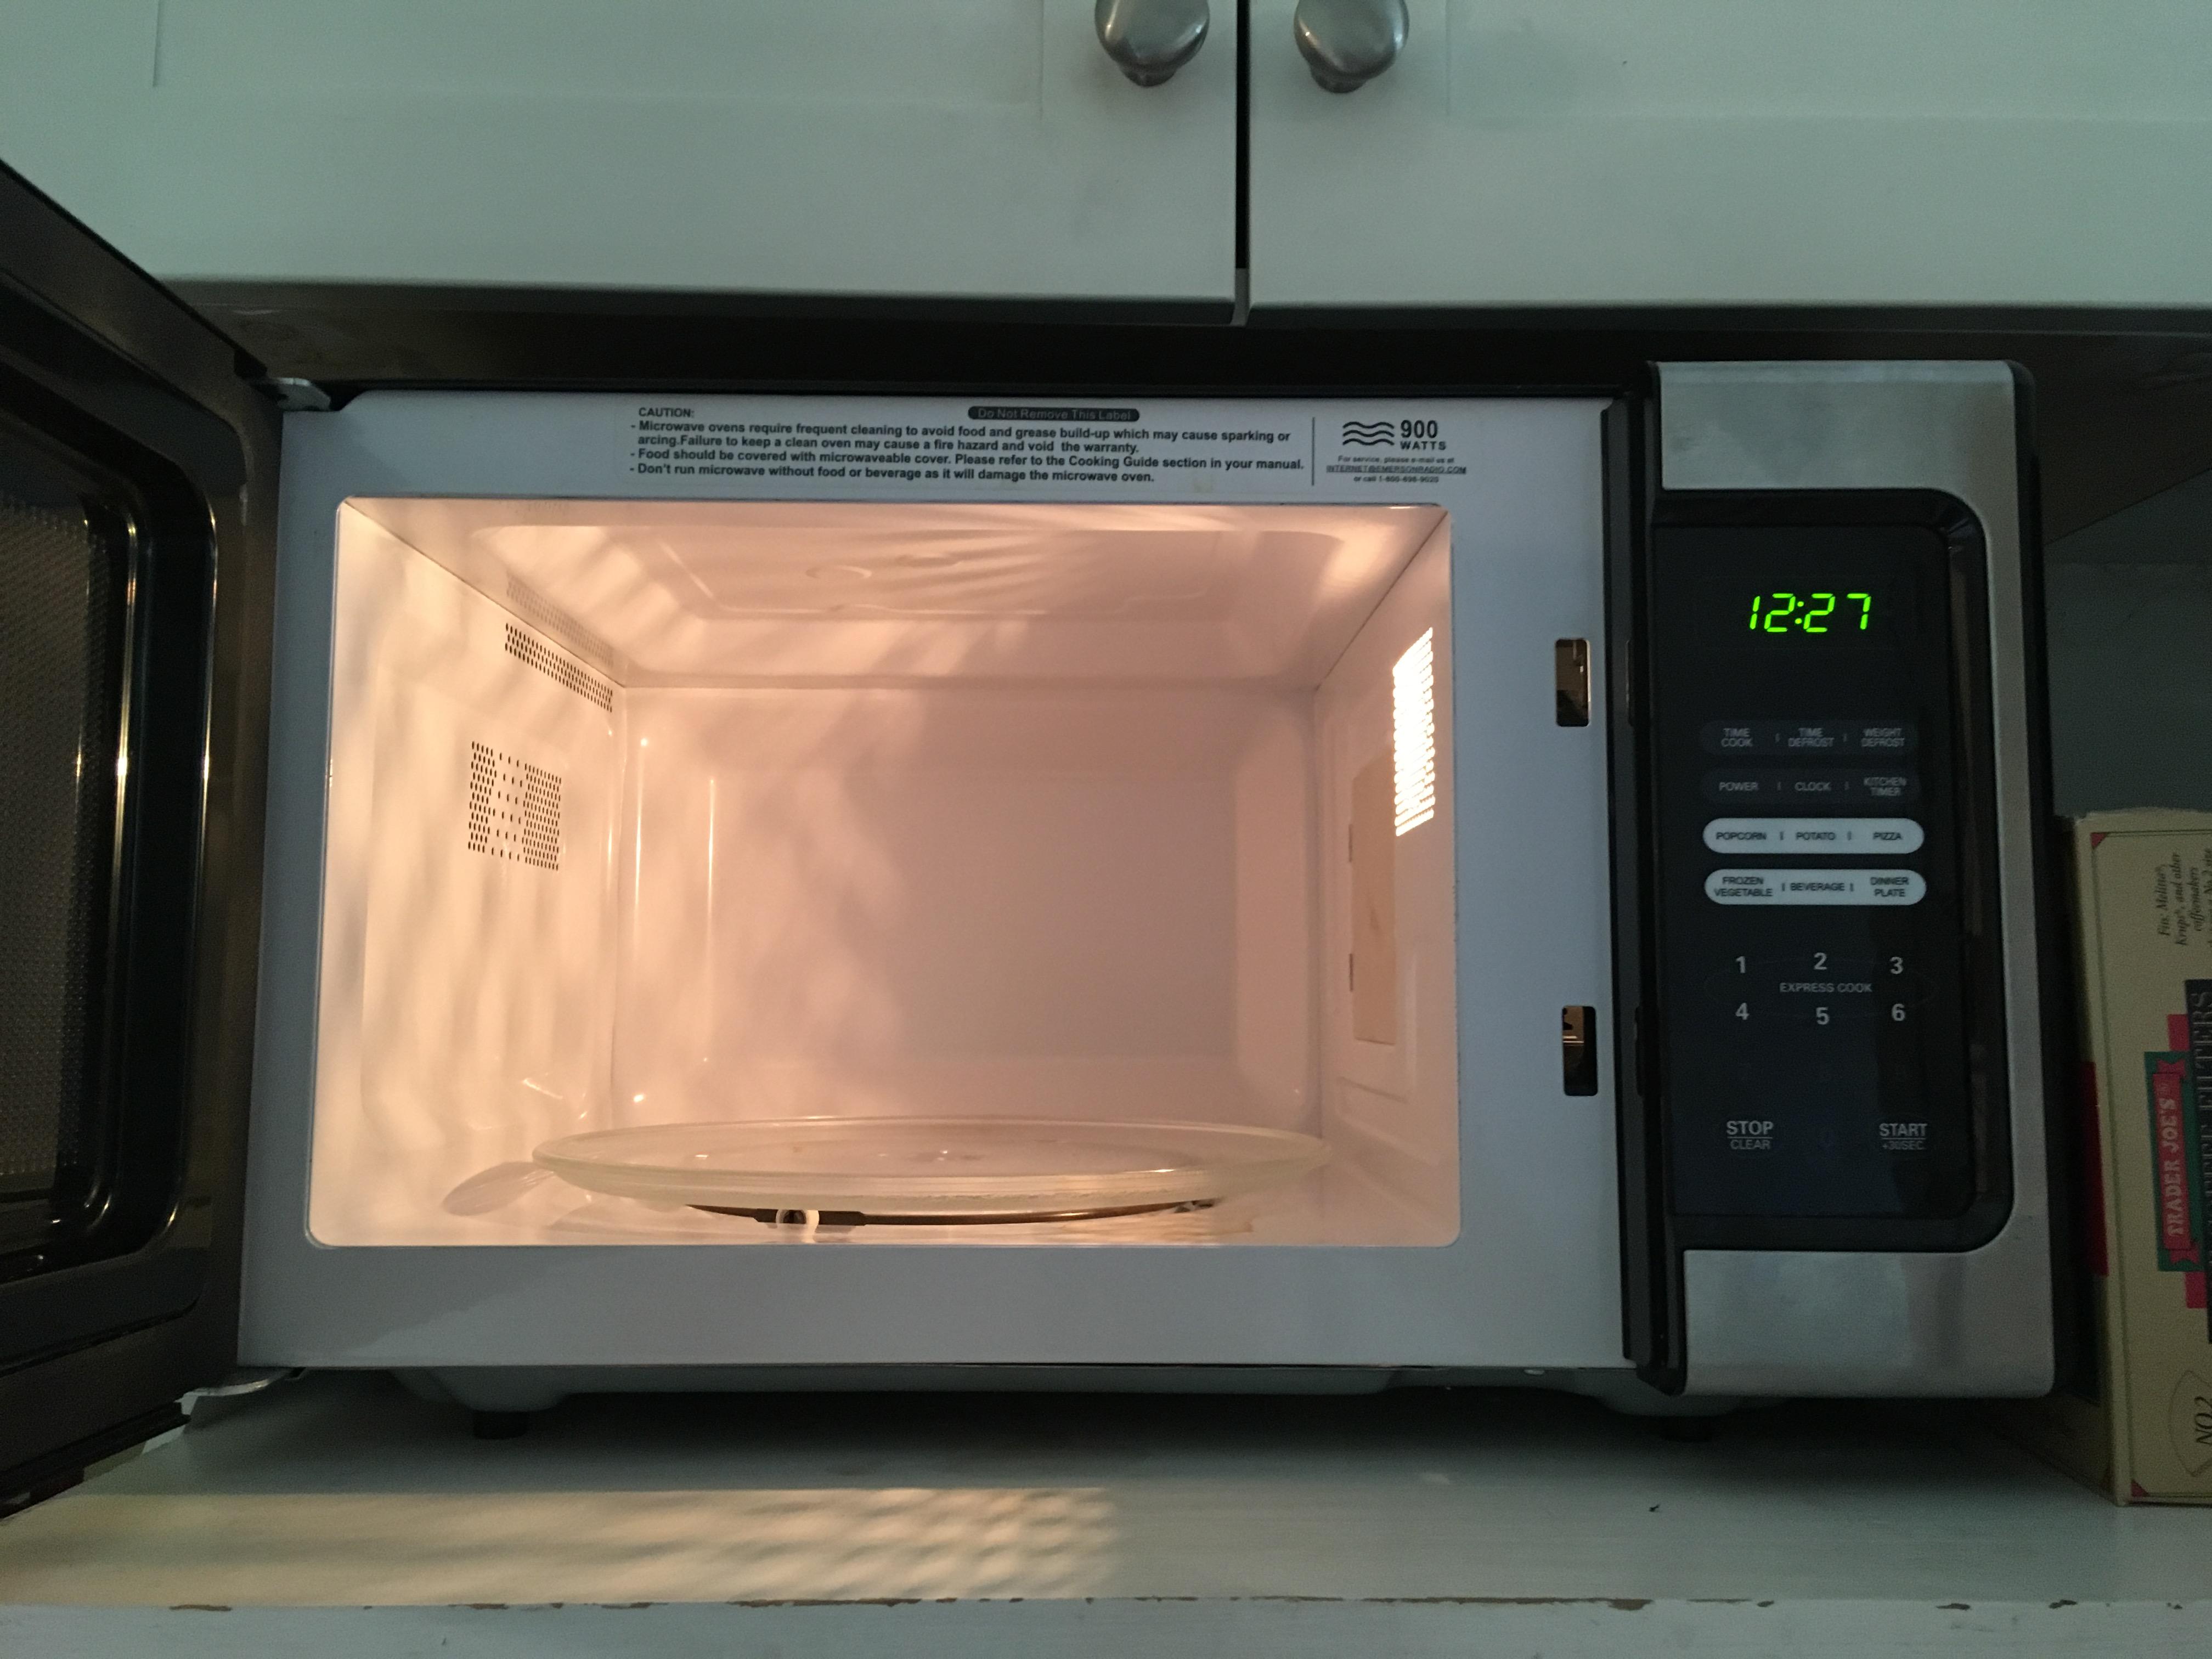 mw9338rd emerson 900w microwave